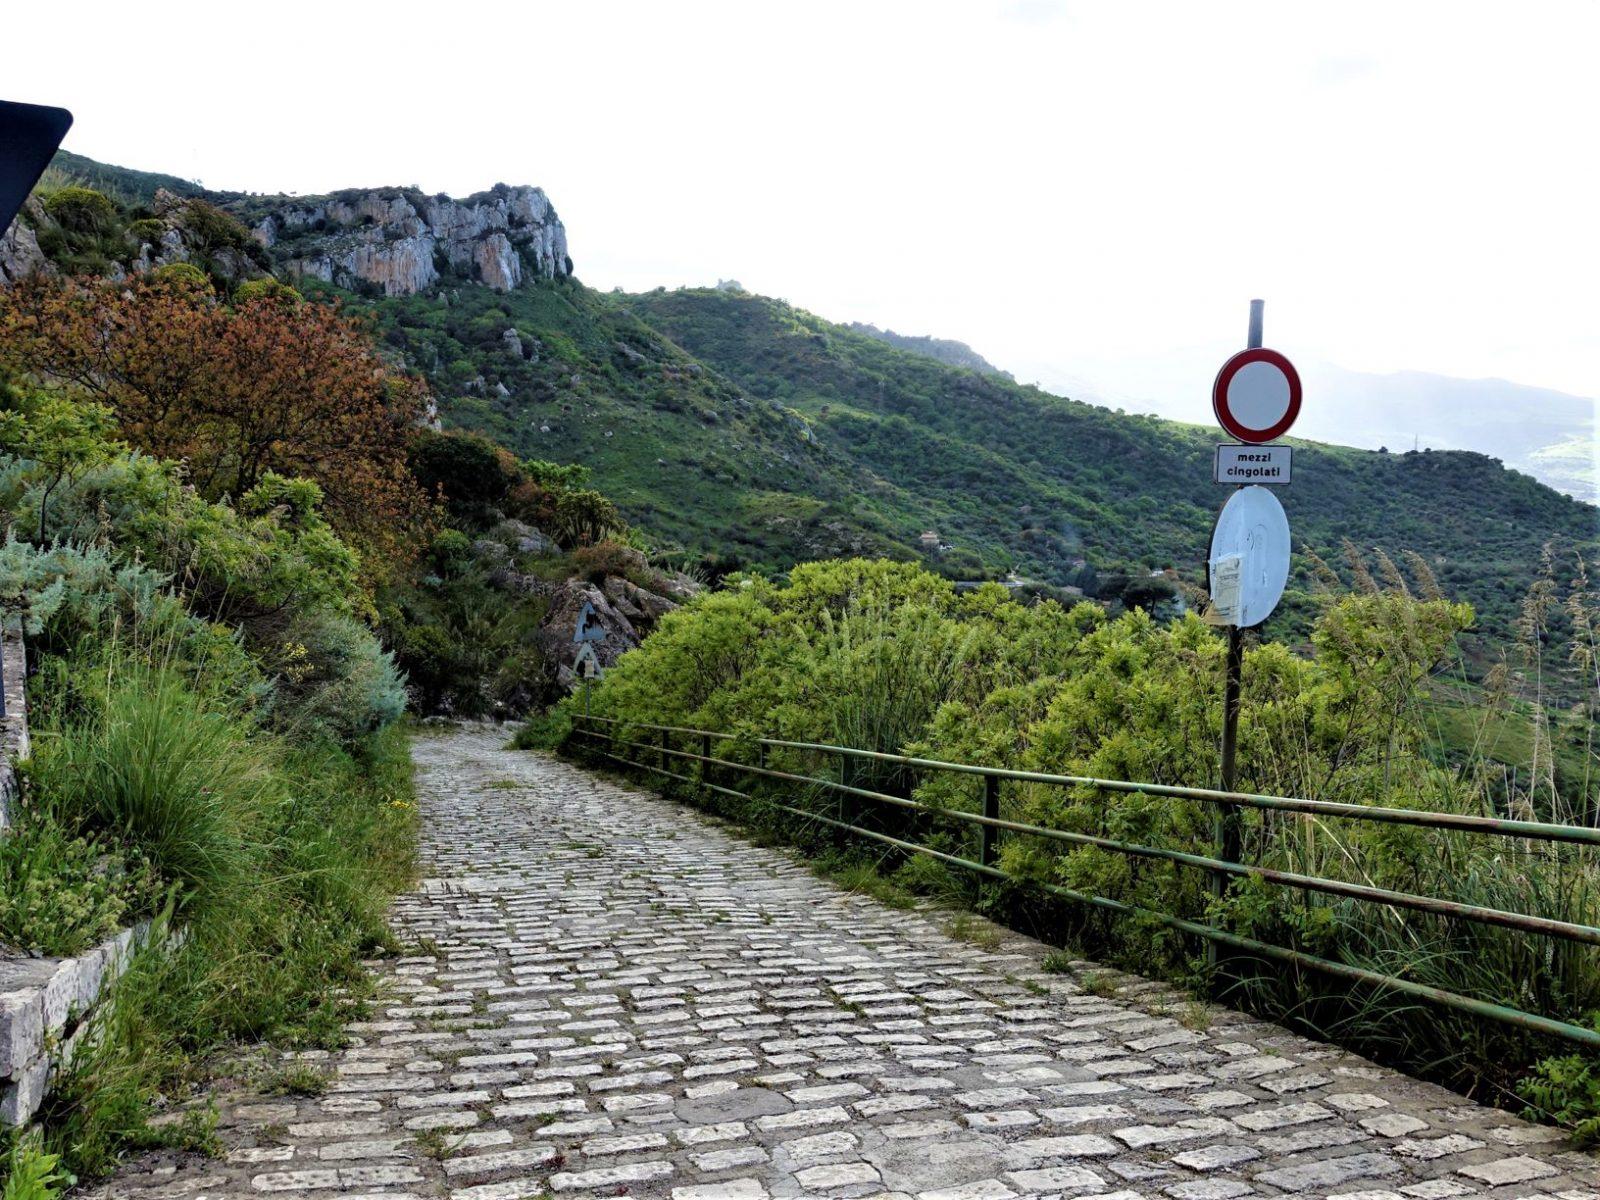 Brostein Sicilia i fjellet